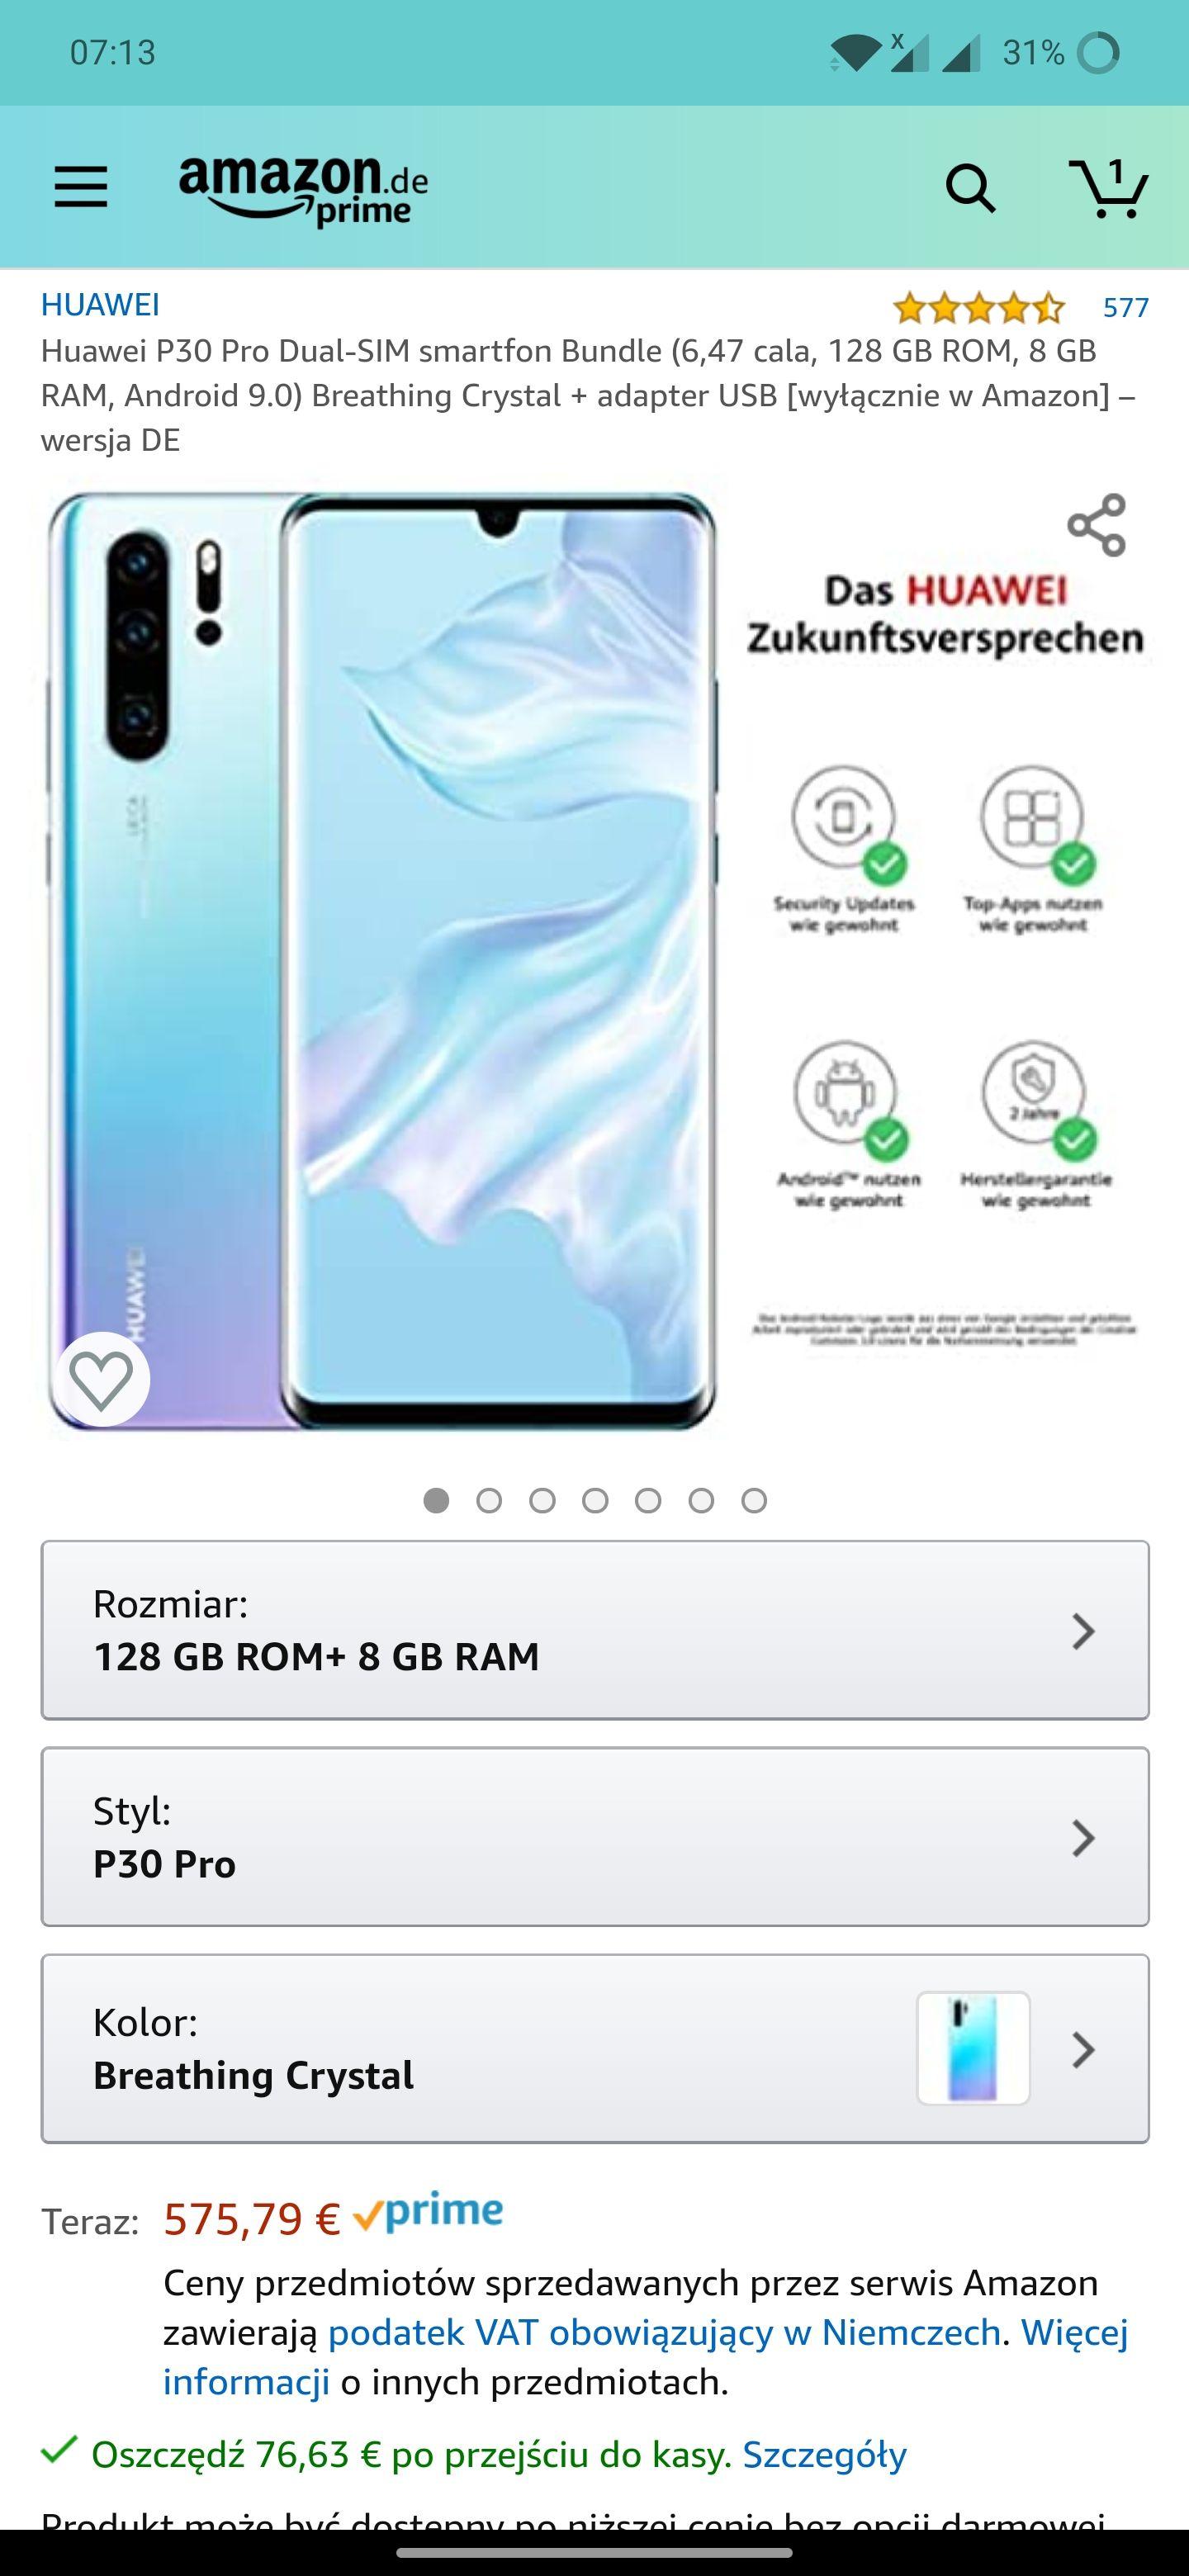 Huawei p30 pro 8/128 499,16€